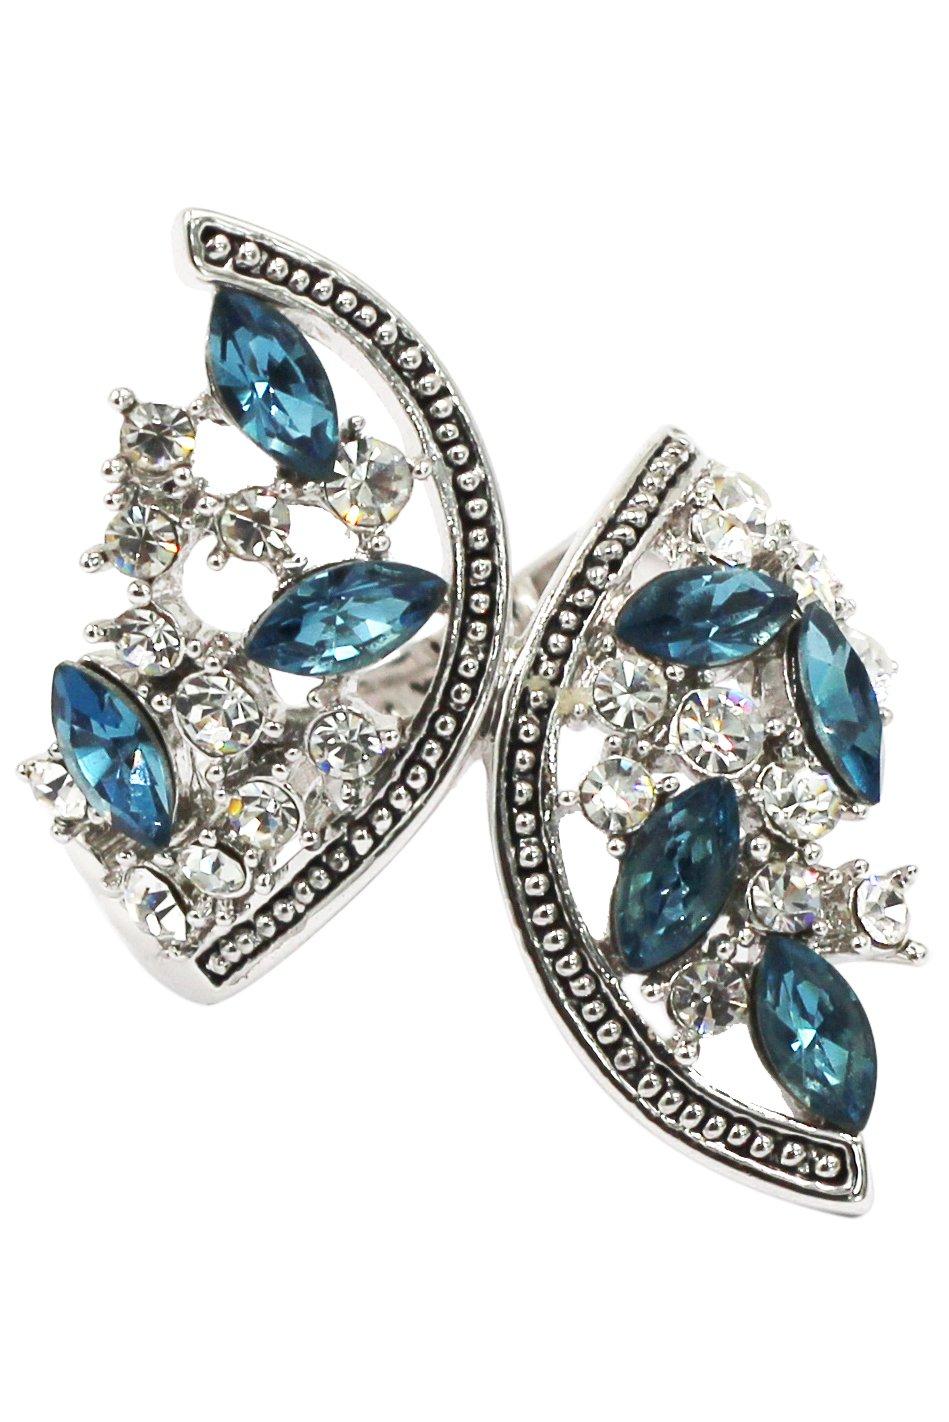 Elegant symmetry crystal silver ring